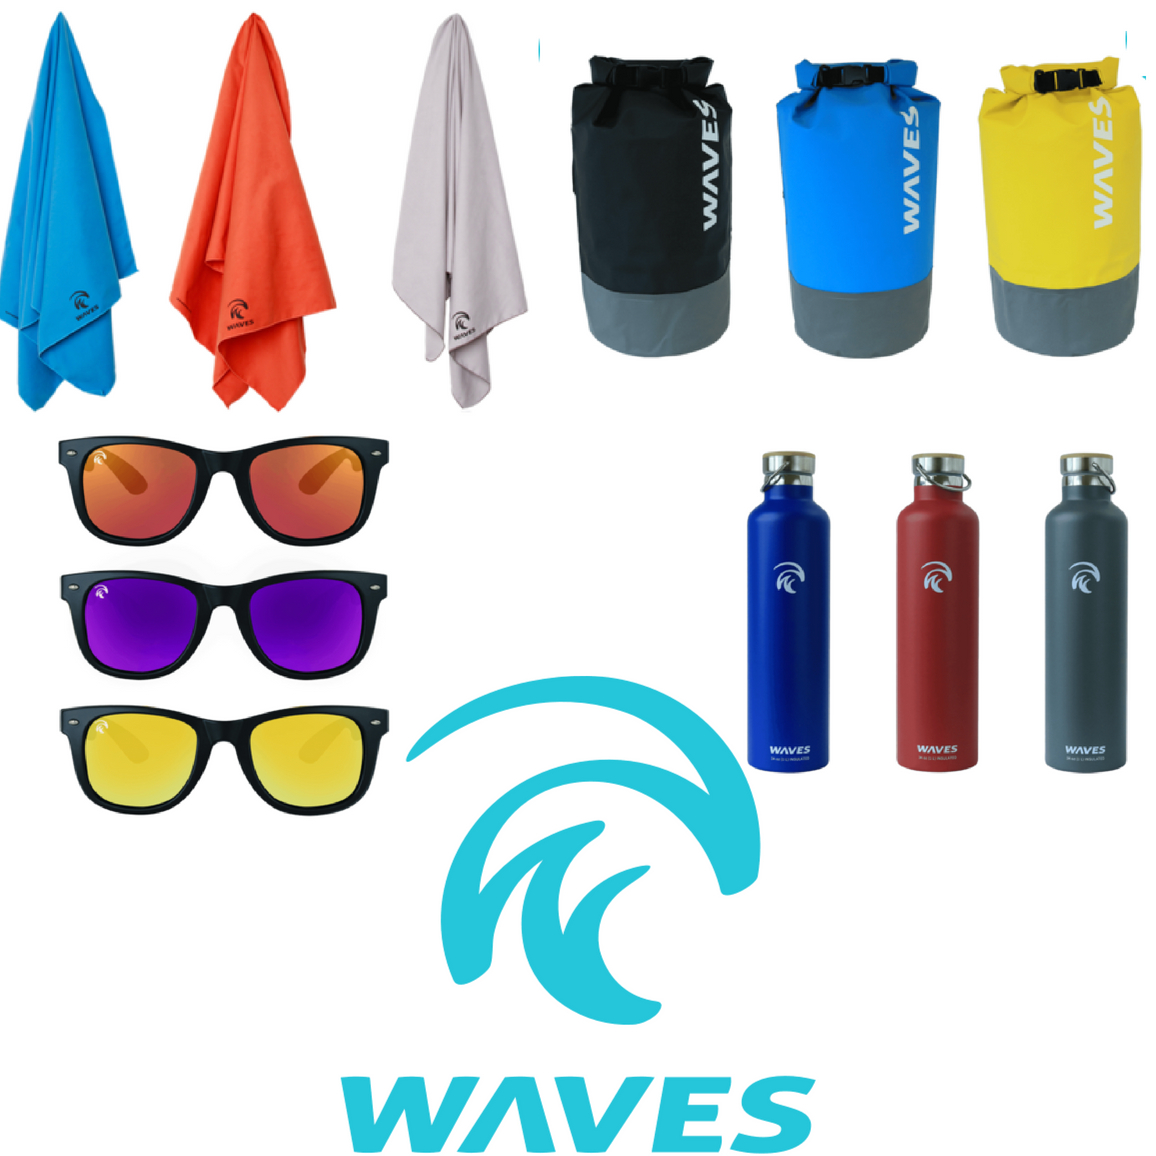 Waves Gear Brand Image.jpg